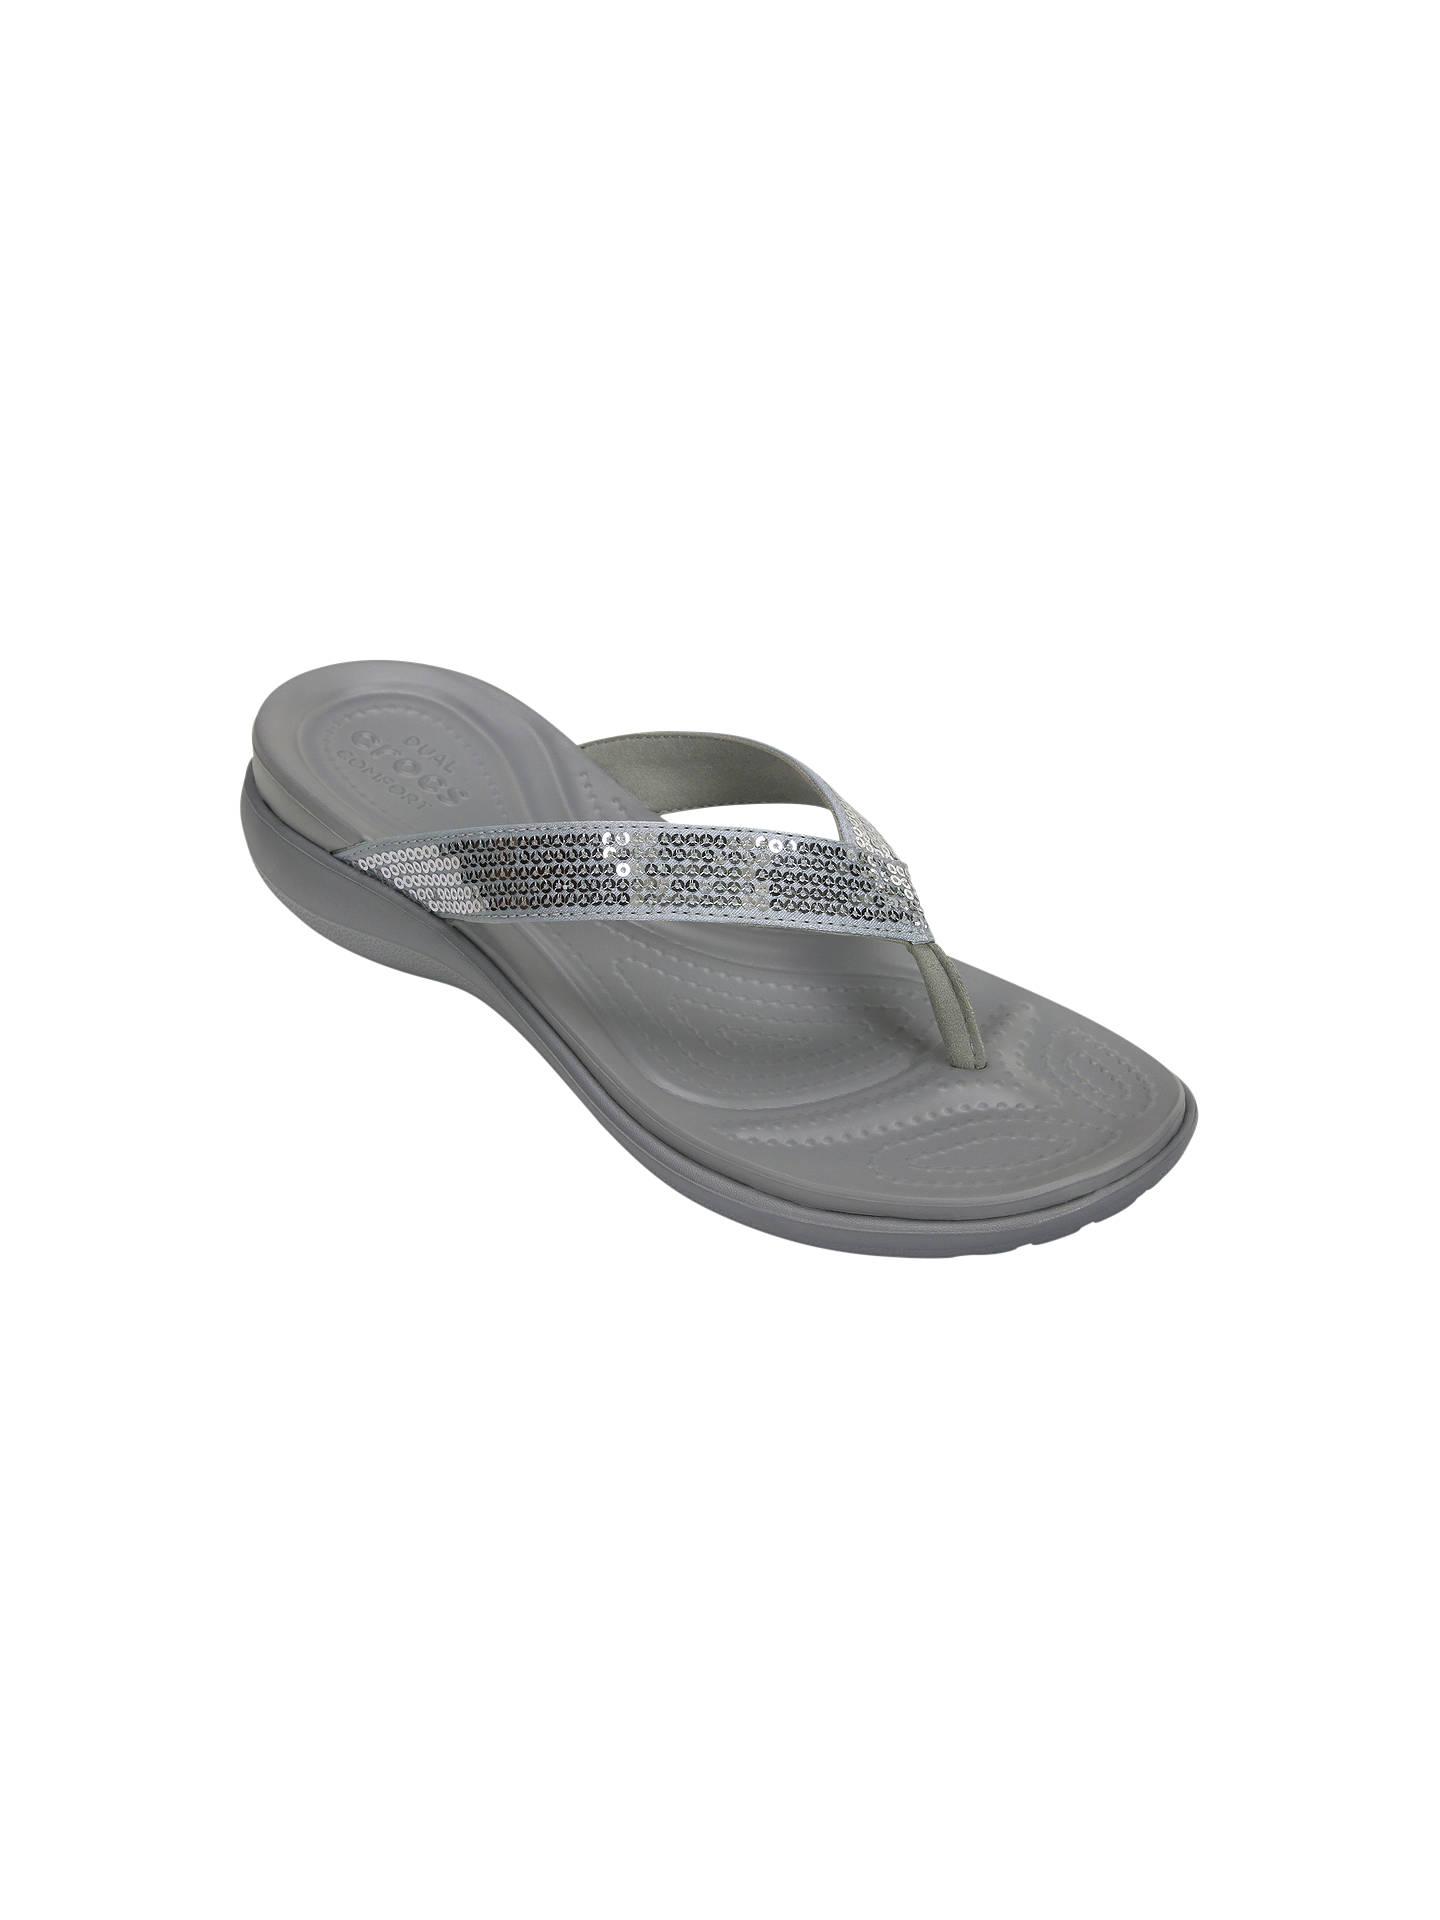 4ce23b102 Buy Crocs Capri V Sequin Flip Flops